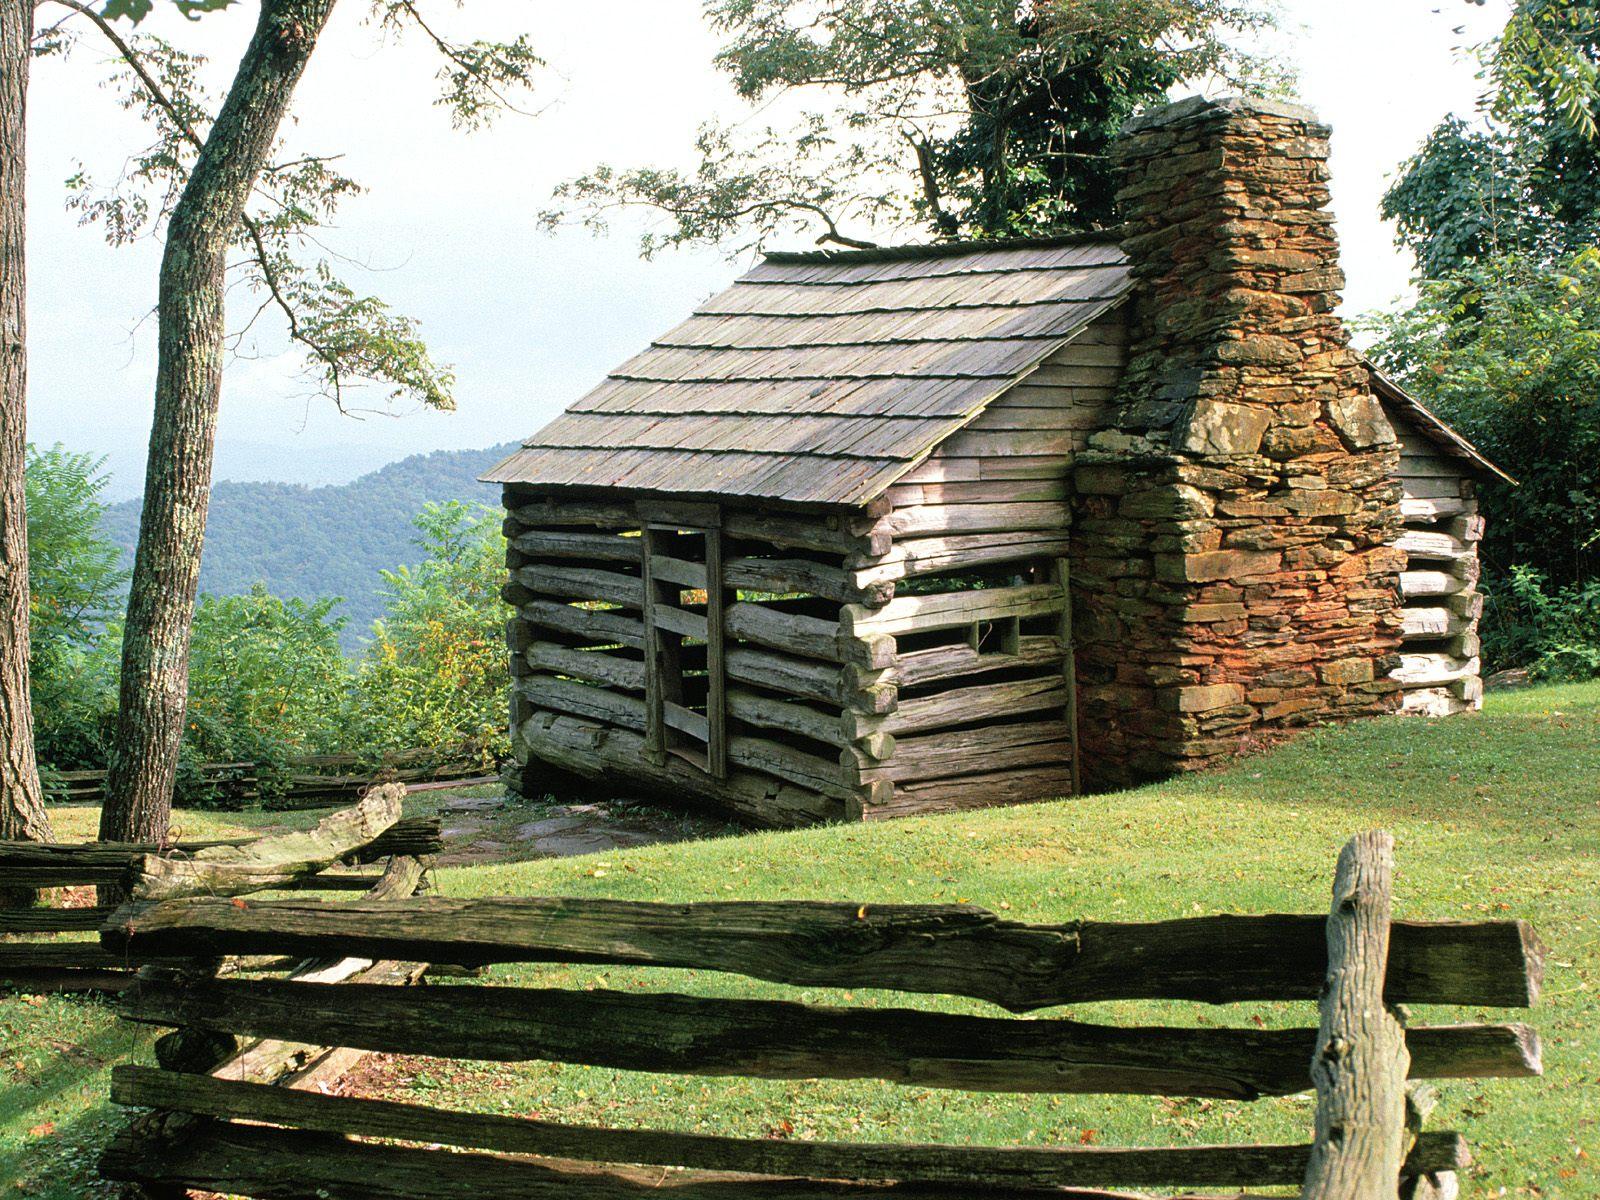 Log Cabin Blue Ridge Parkway Virginia Related river 4 Moat Wallpapers 1600x1200